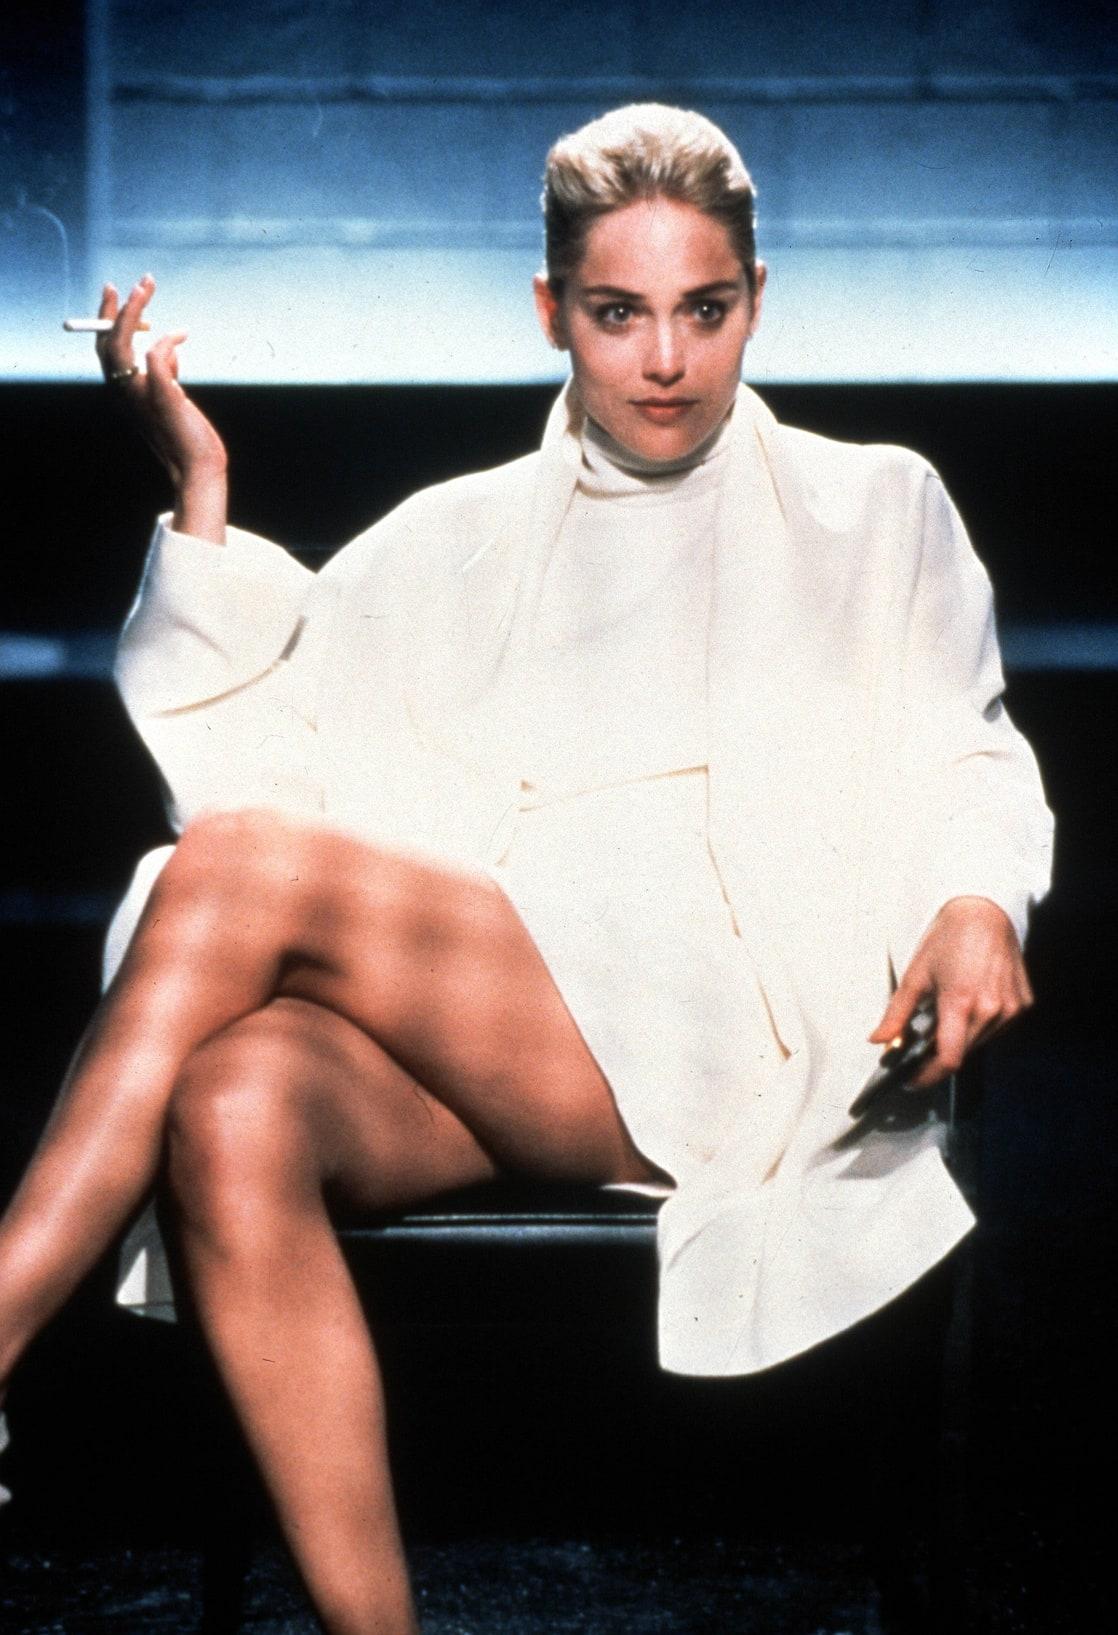 Animal Instincts 1992 Movie picture of basic instinct (1992)